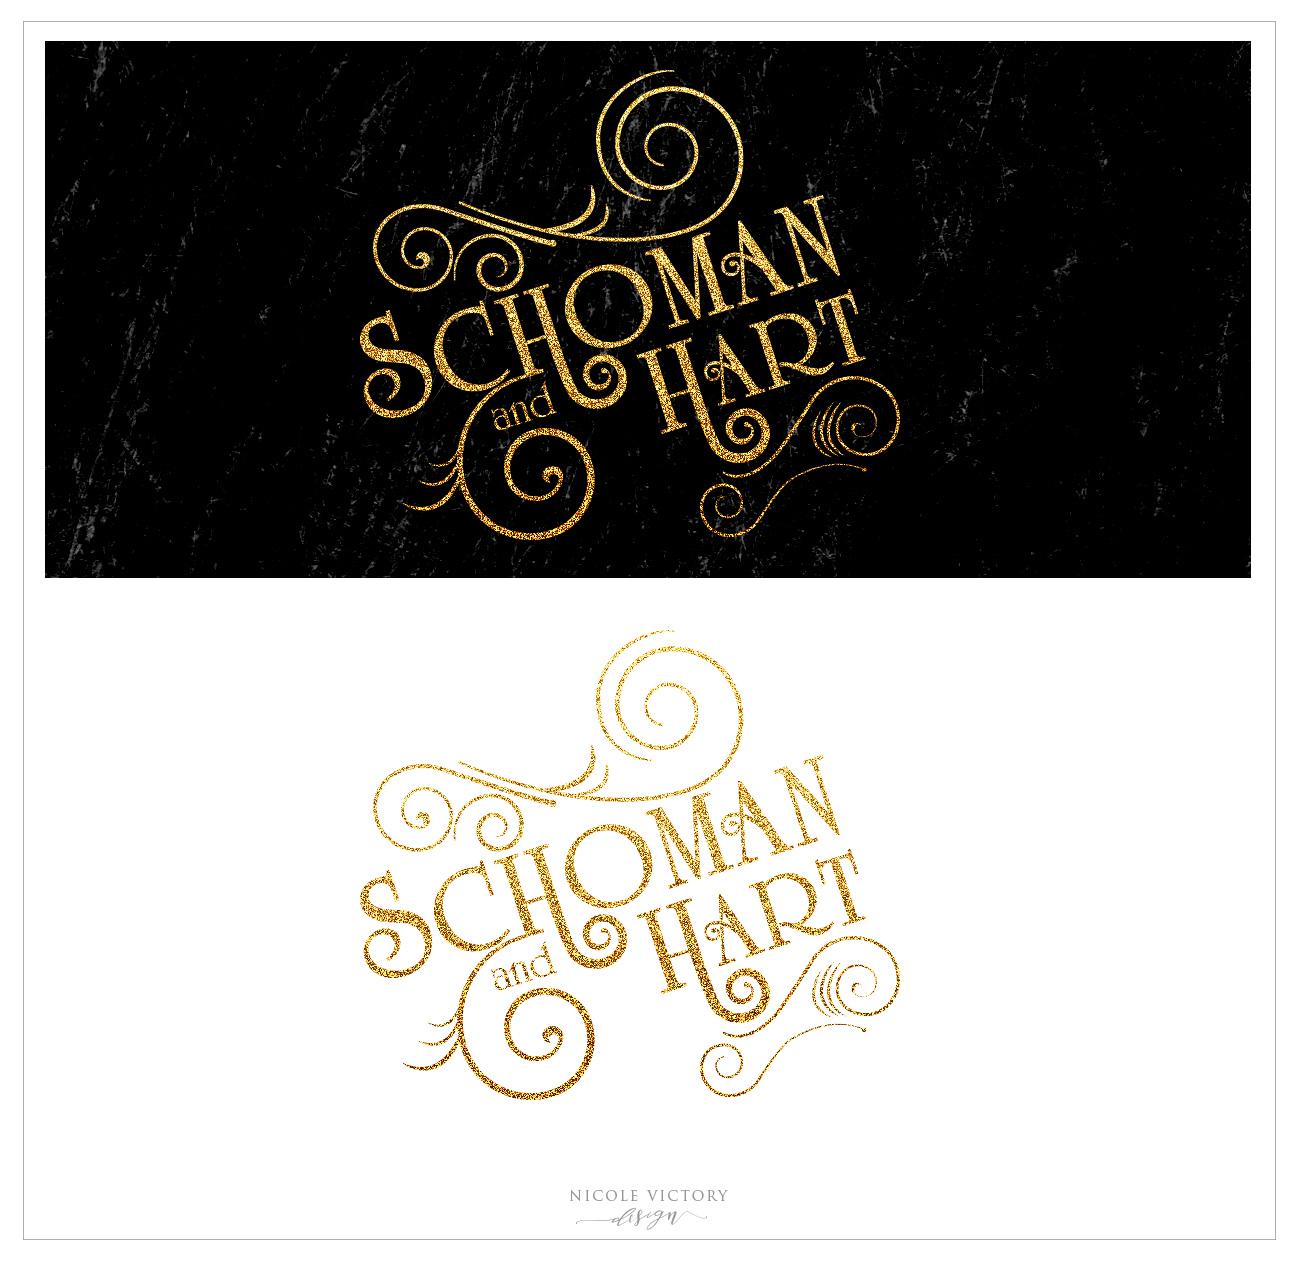 Logo Design by Nicole Victory Design. Schoman and Hart